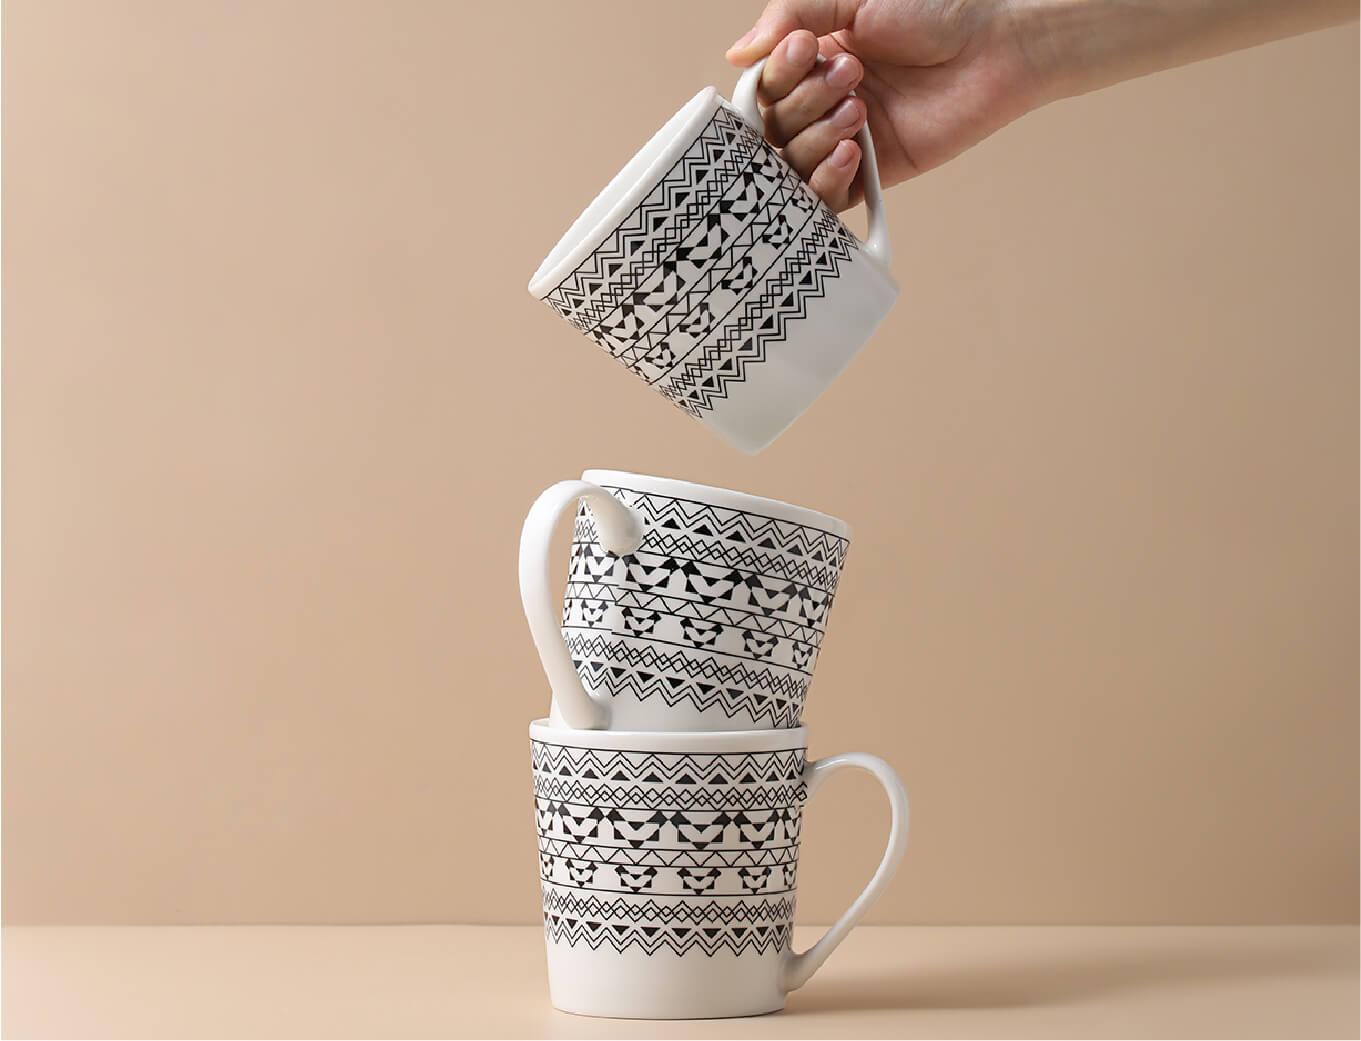 Dowan tableware designer coffee cups